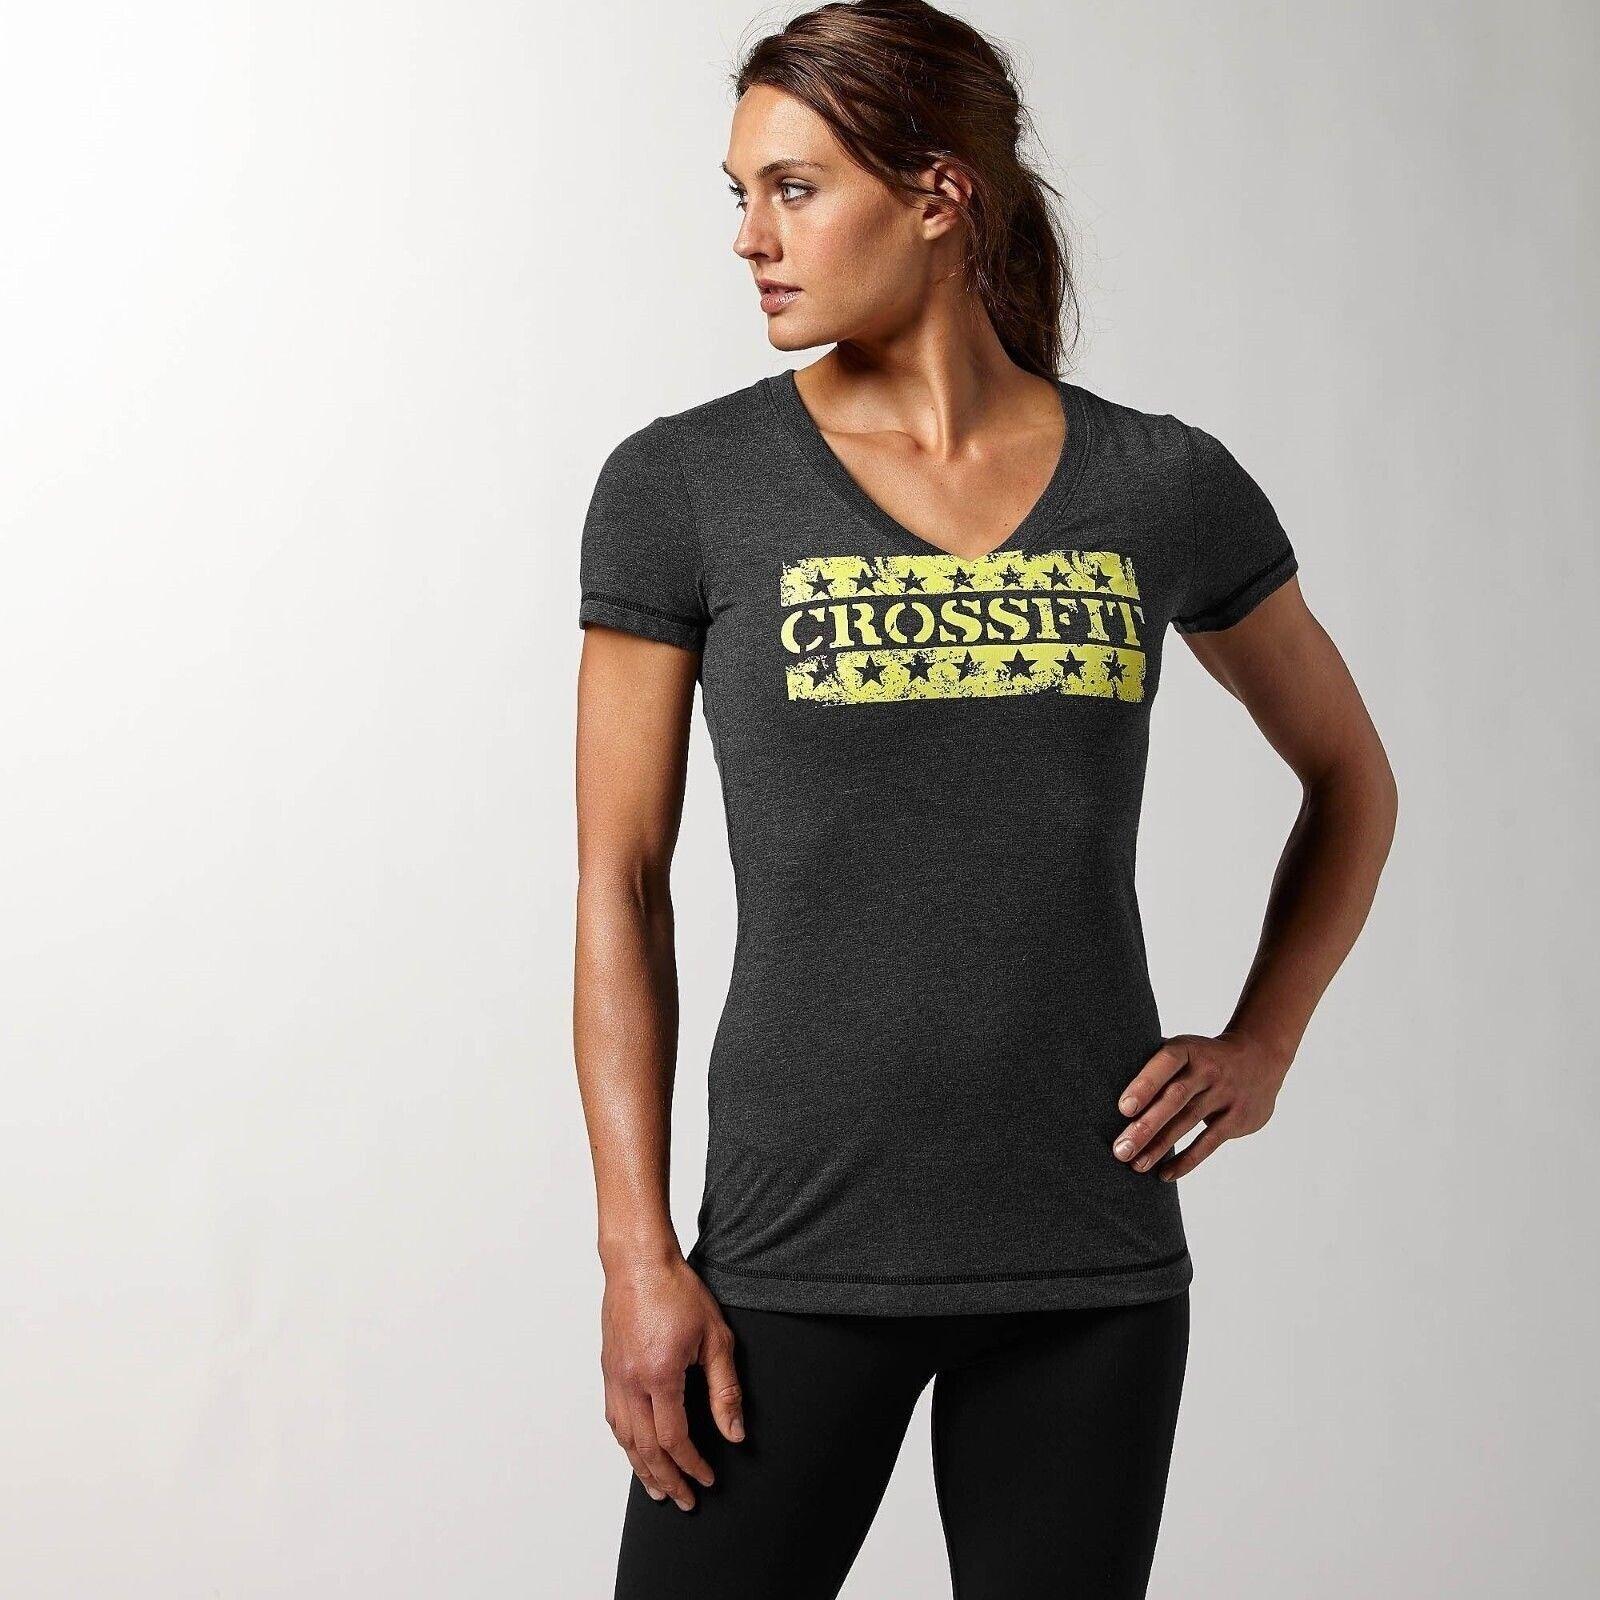 [Z92604] New Women's REEBOK Crossfit Graphic V-neck Tee - MSRP